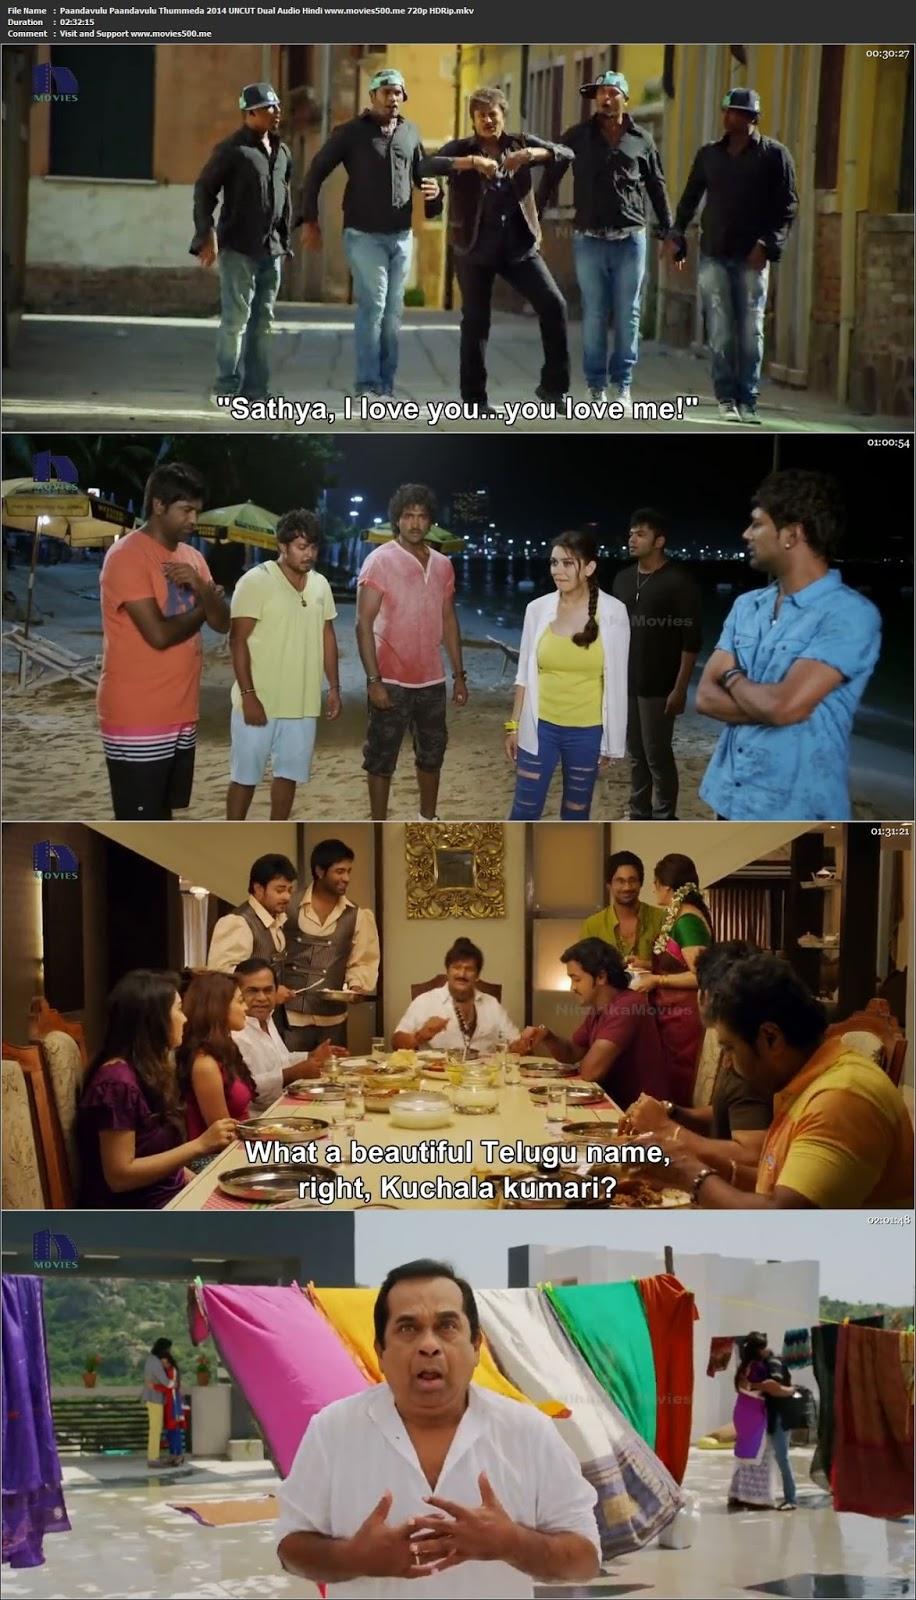 Paandavulu Paandavulu Thummeda 2014 UNCUT Dual Audio Hindi HDRip 720p at movies500.info